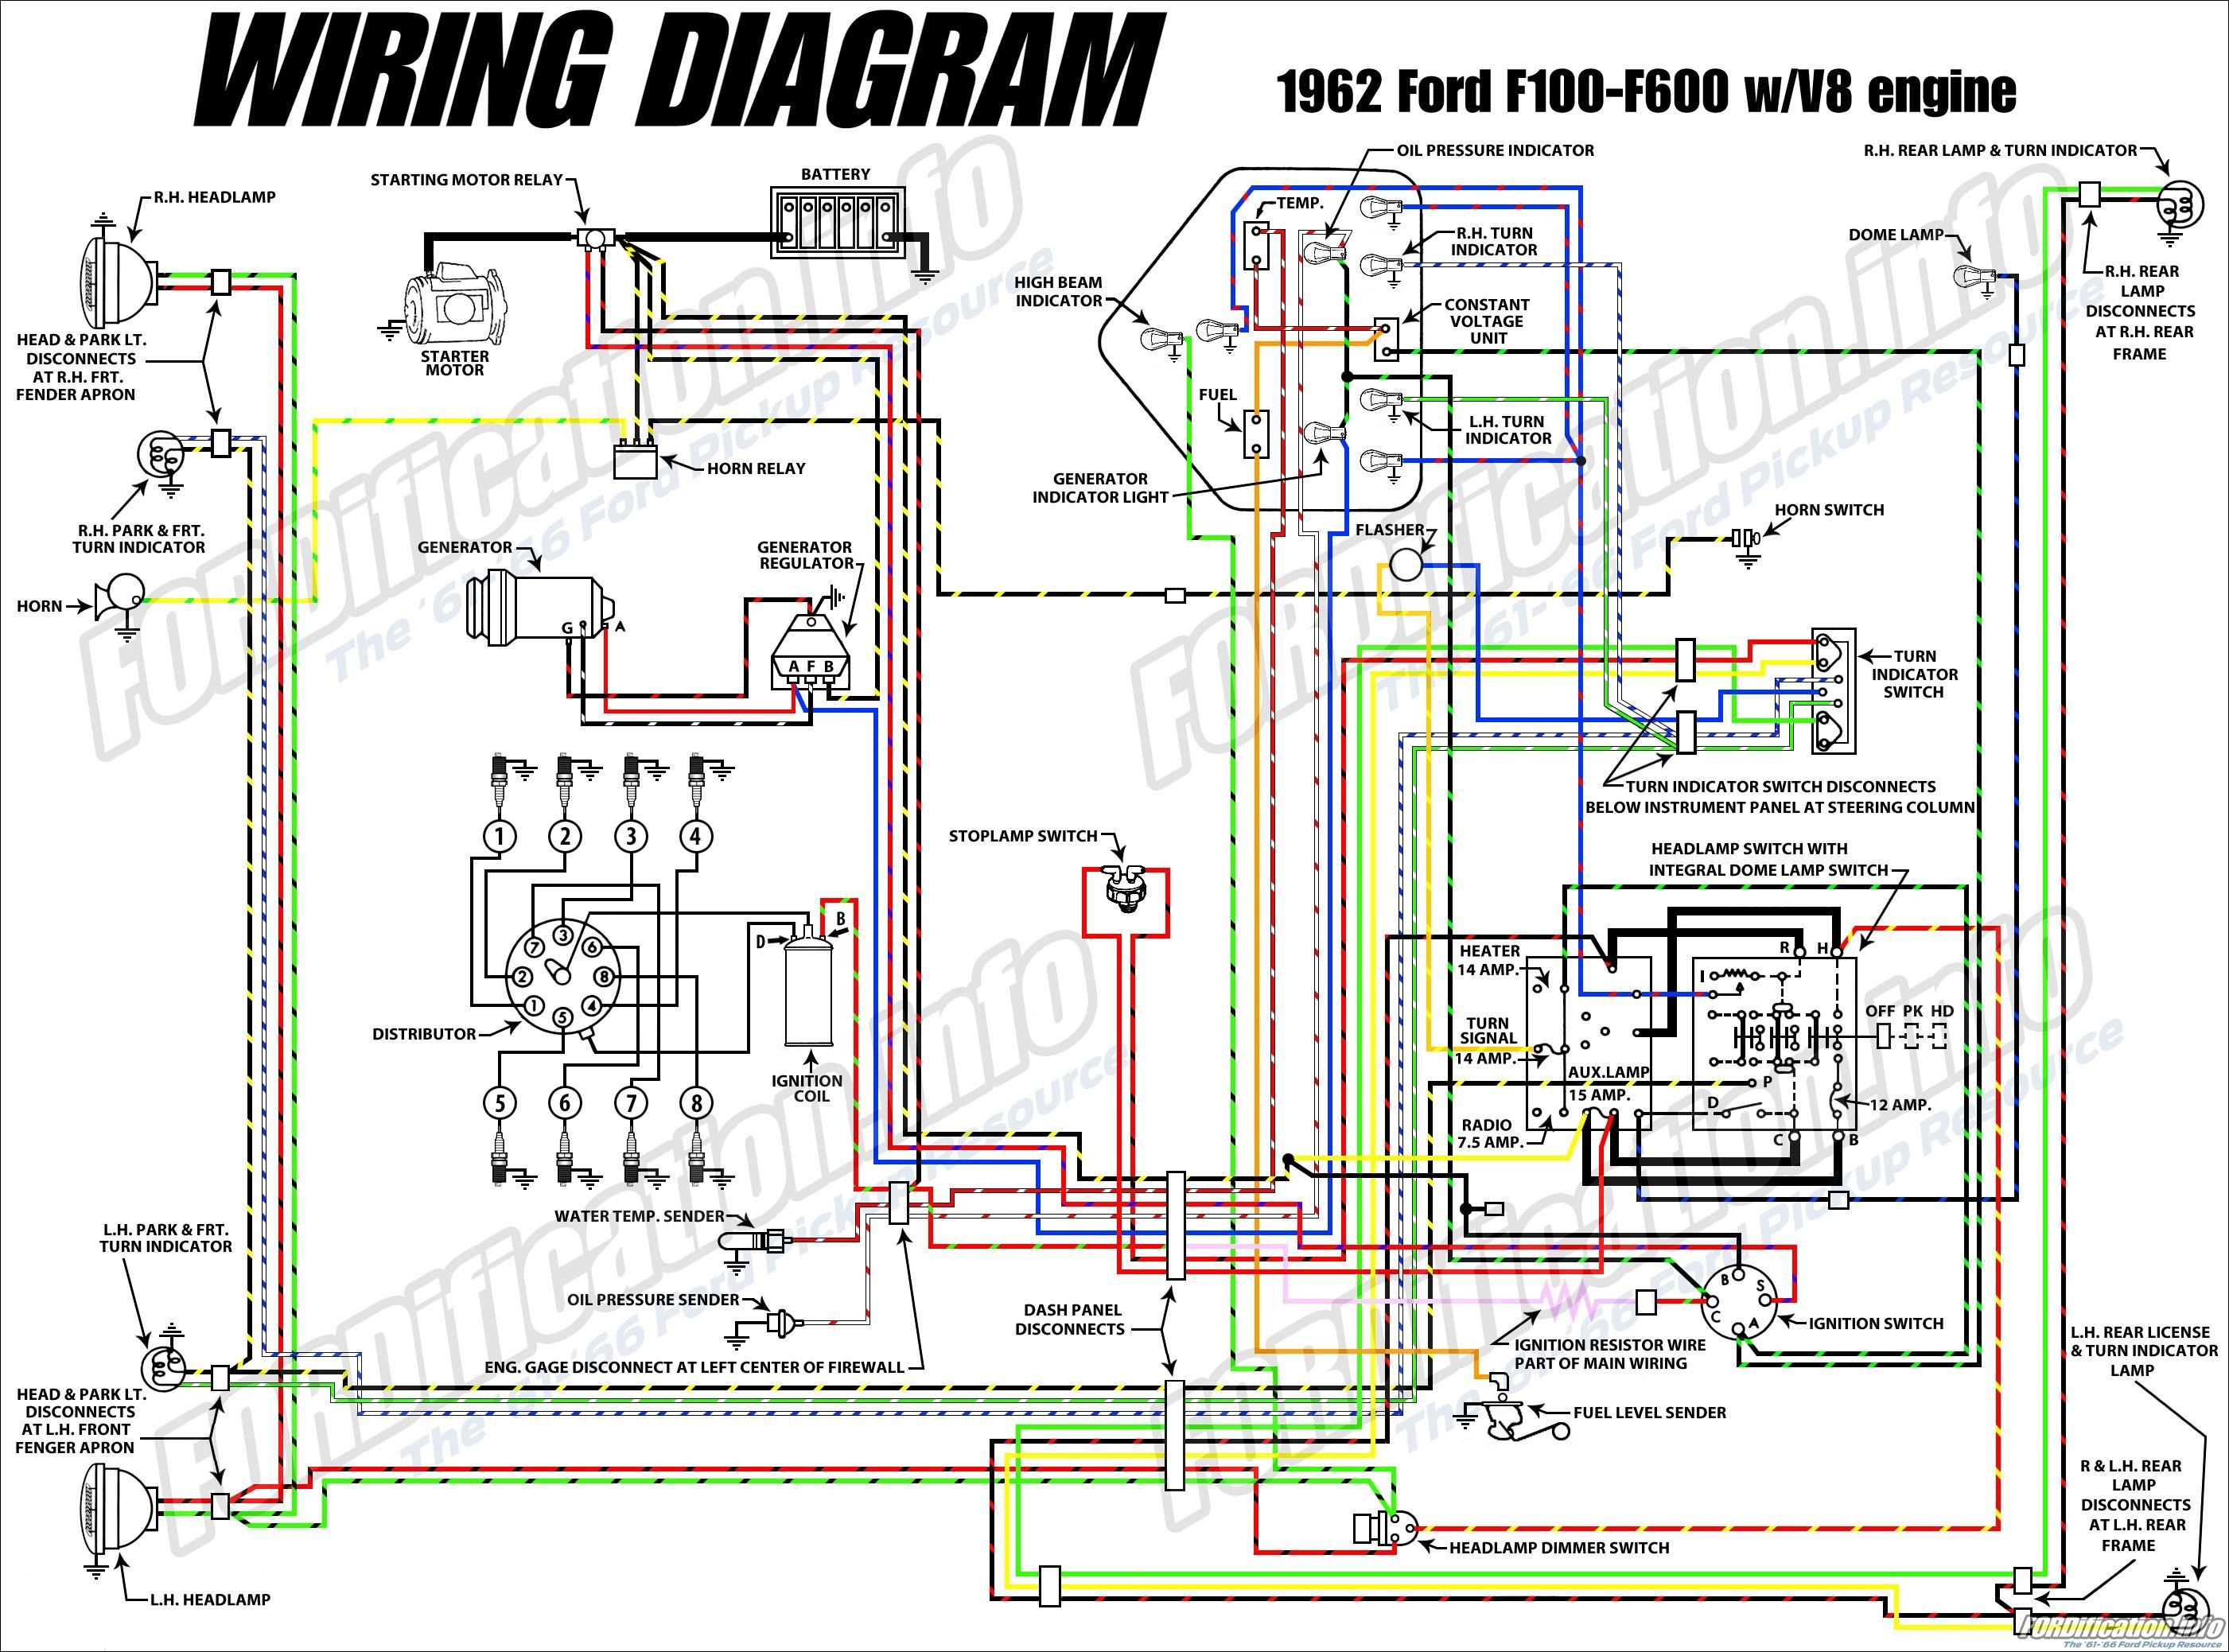 Speed Tech Lights Wiring Diagram   Manual E-Books - Speed Tech Lights Wiring Diagram